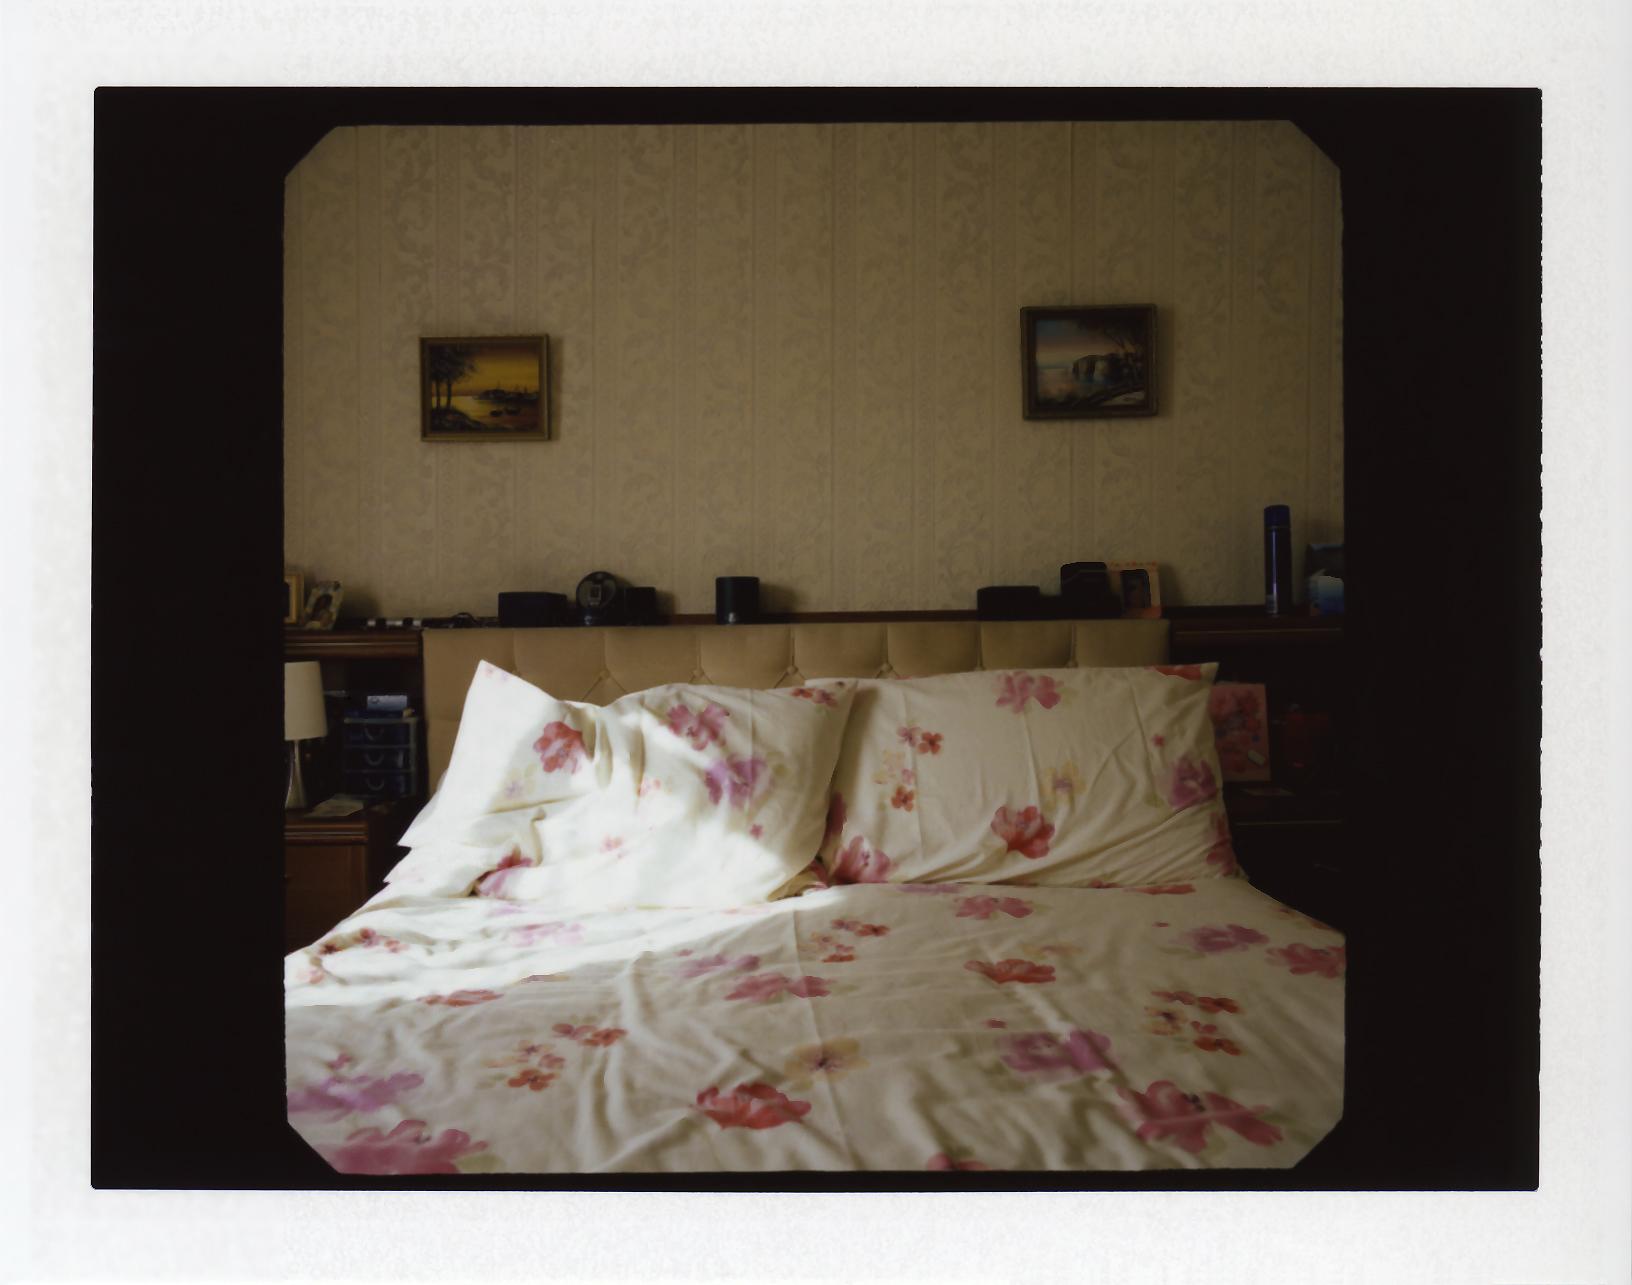 polaroid016editsharpen.jpg